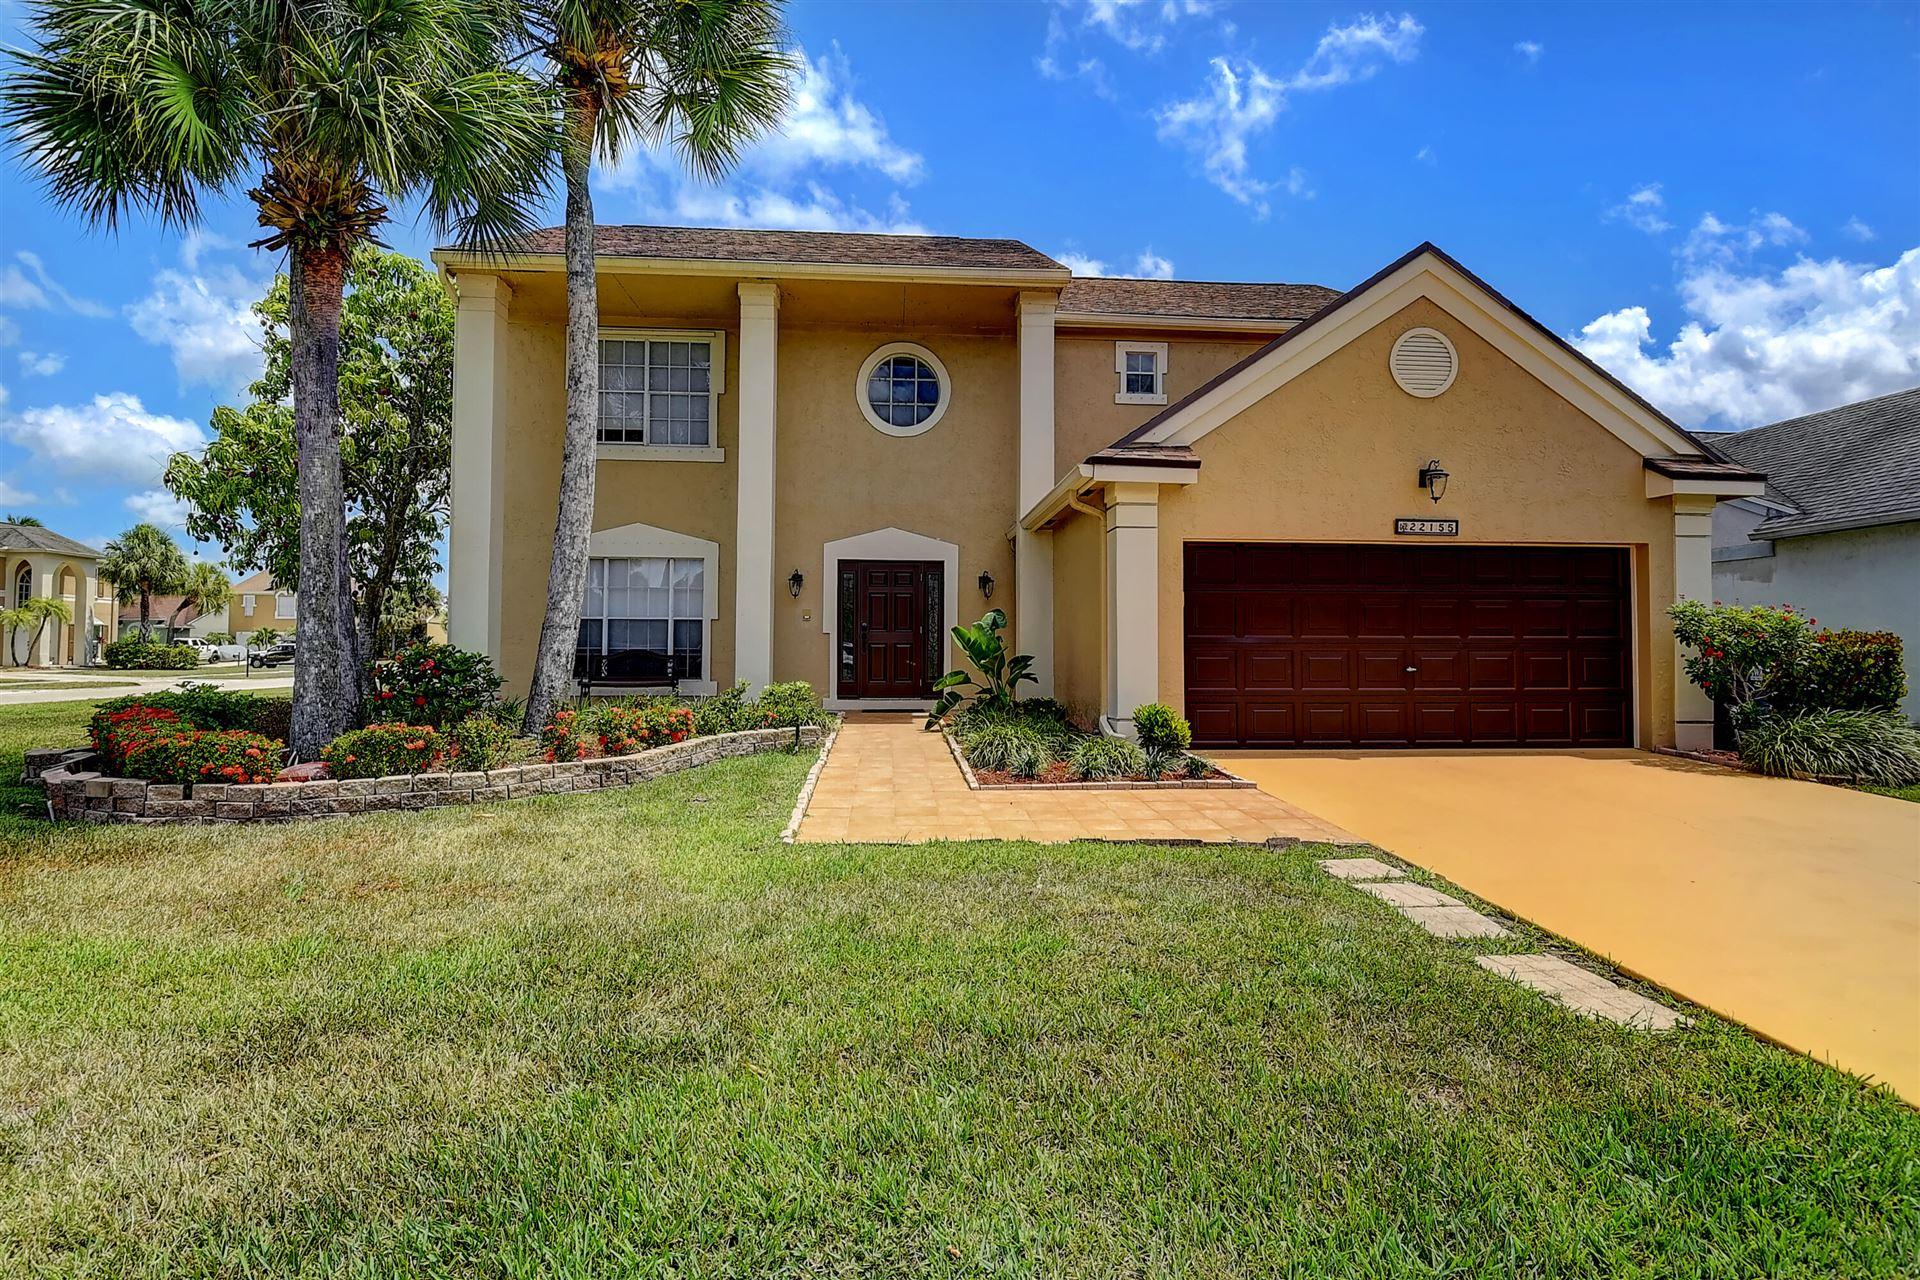 22155 Flower Drive, Boca Raton, FL 33428 - MLS#: RX-10711830